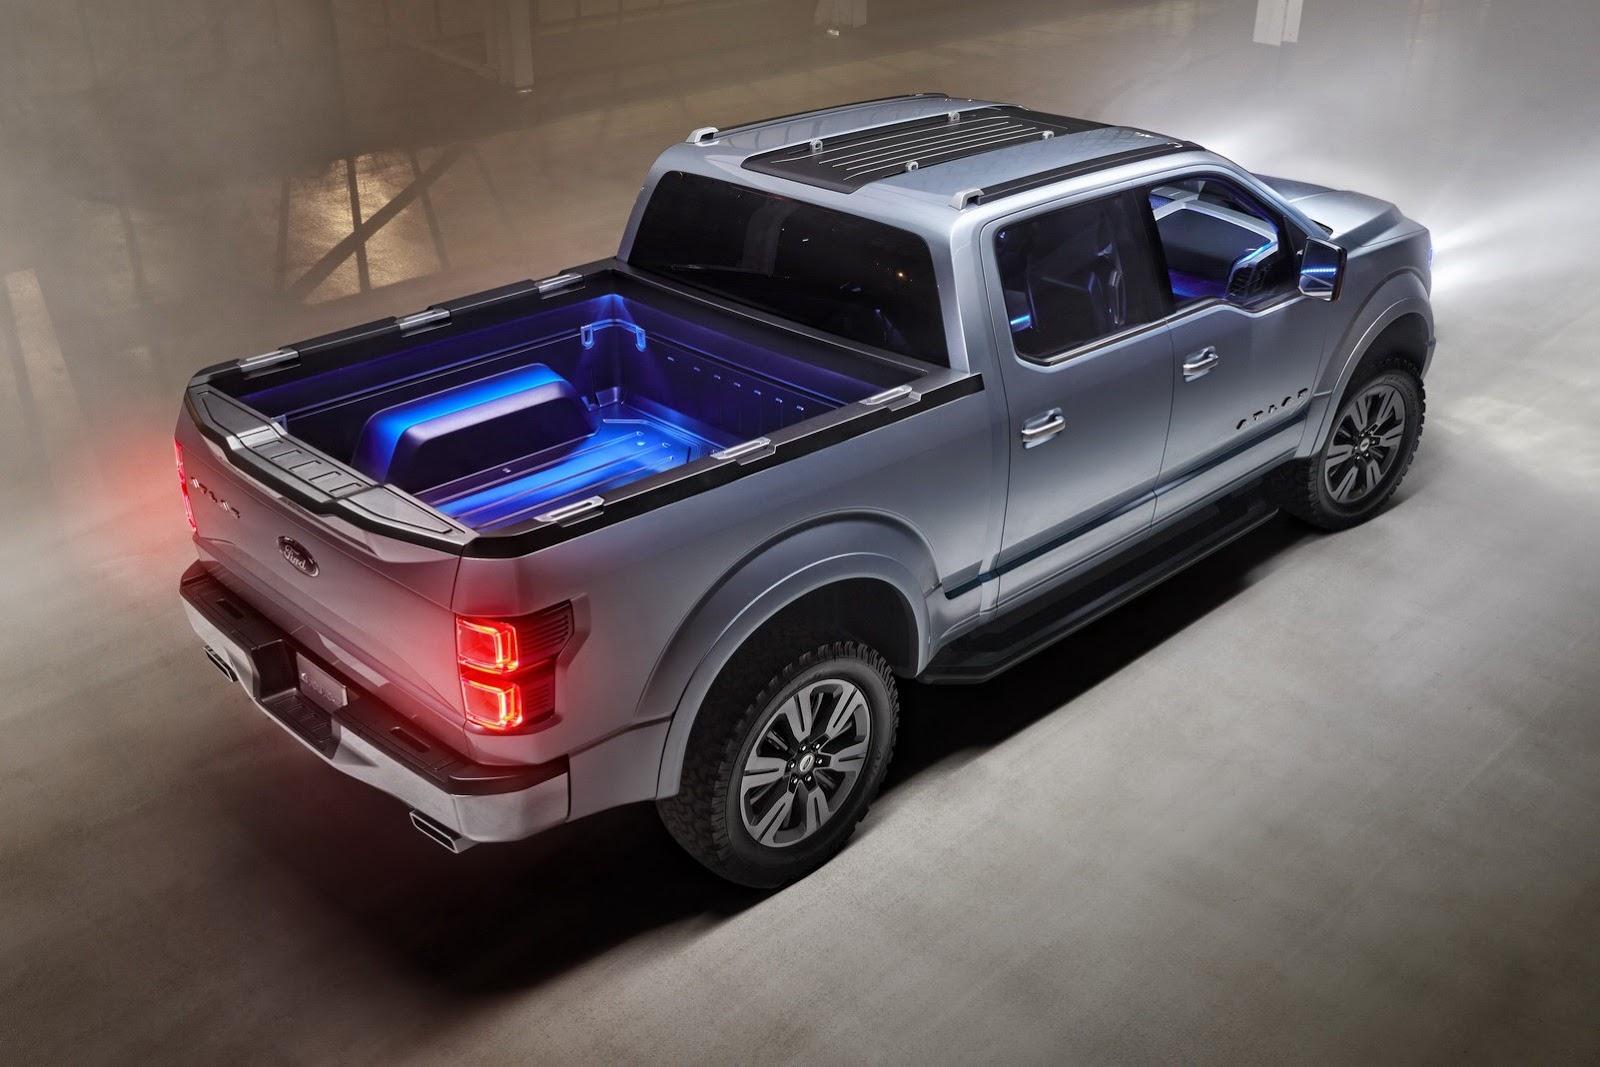 2014 Ford Atlas Pickup F 150 Preço, Consumo, Fotos, videos, Ficha ...